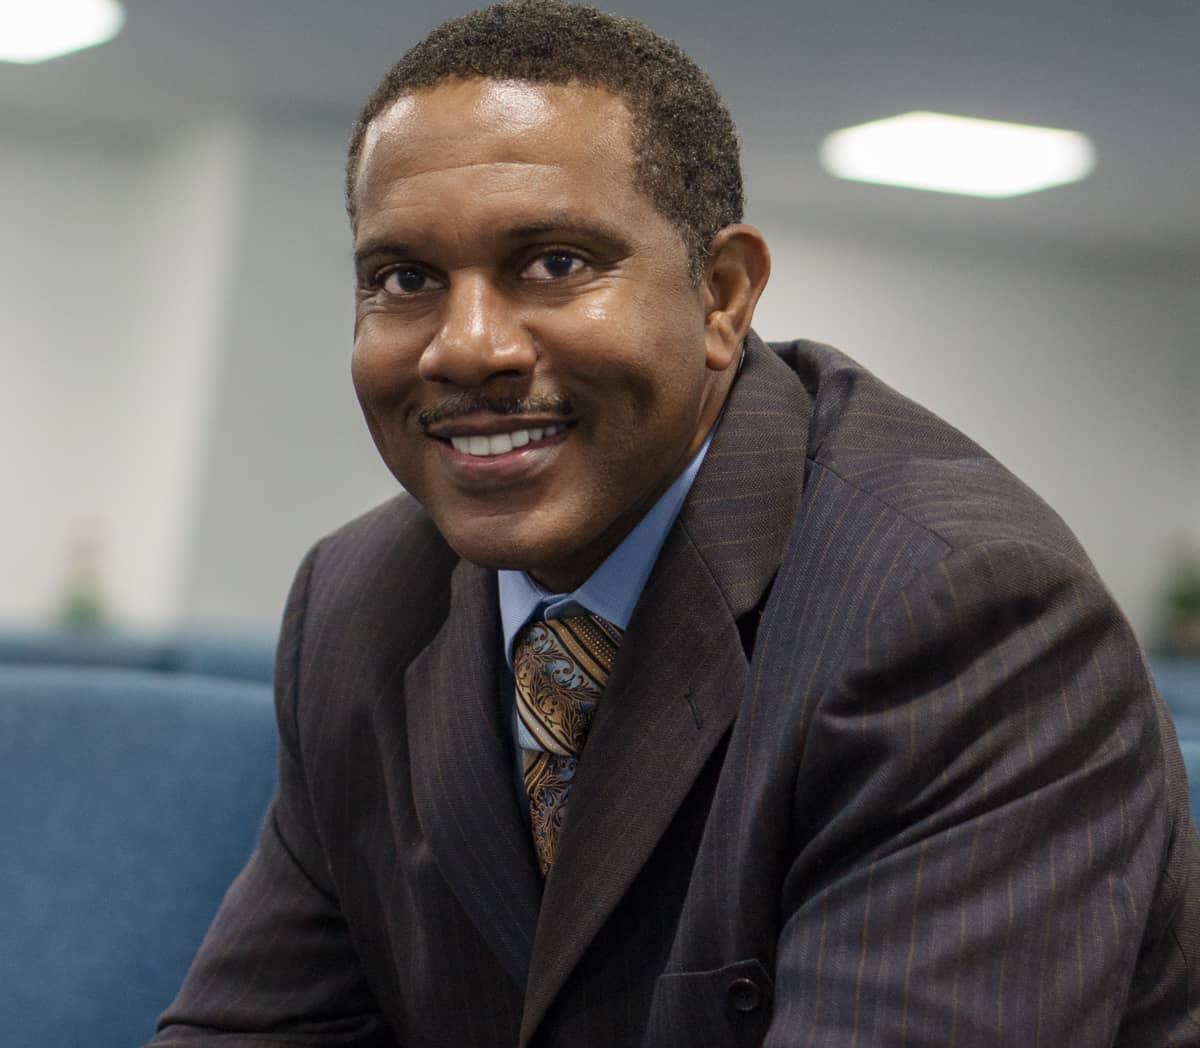 Pastor Terry Whitaker